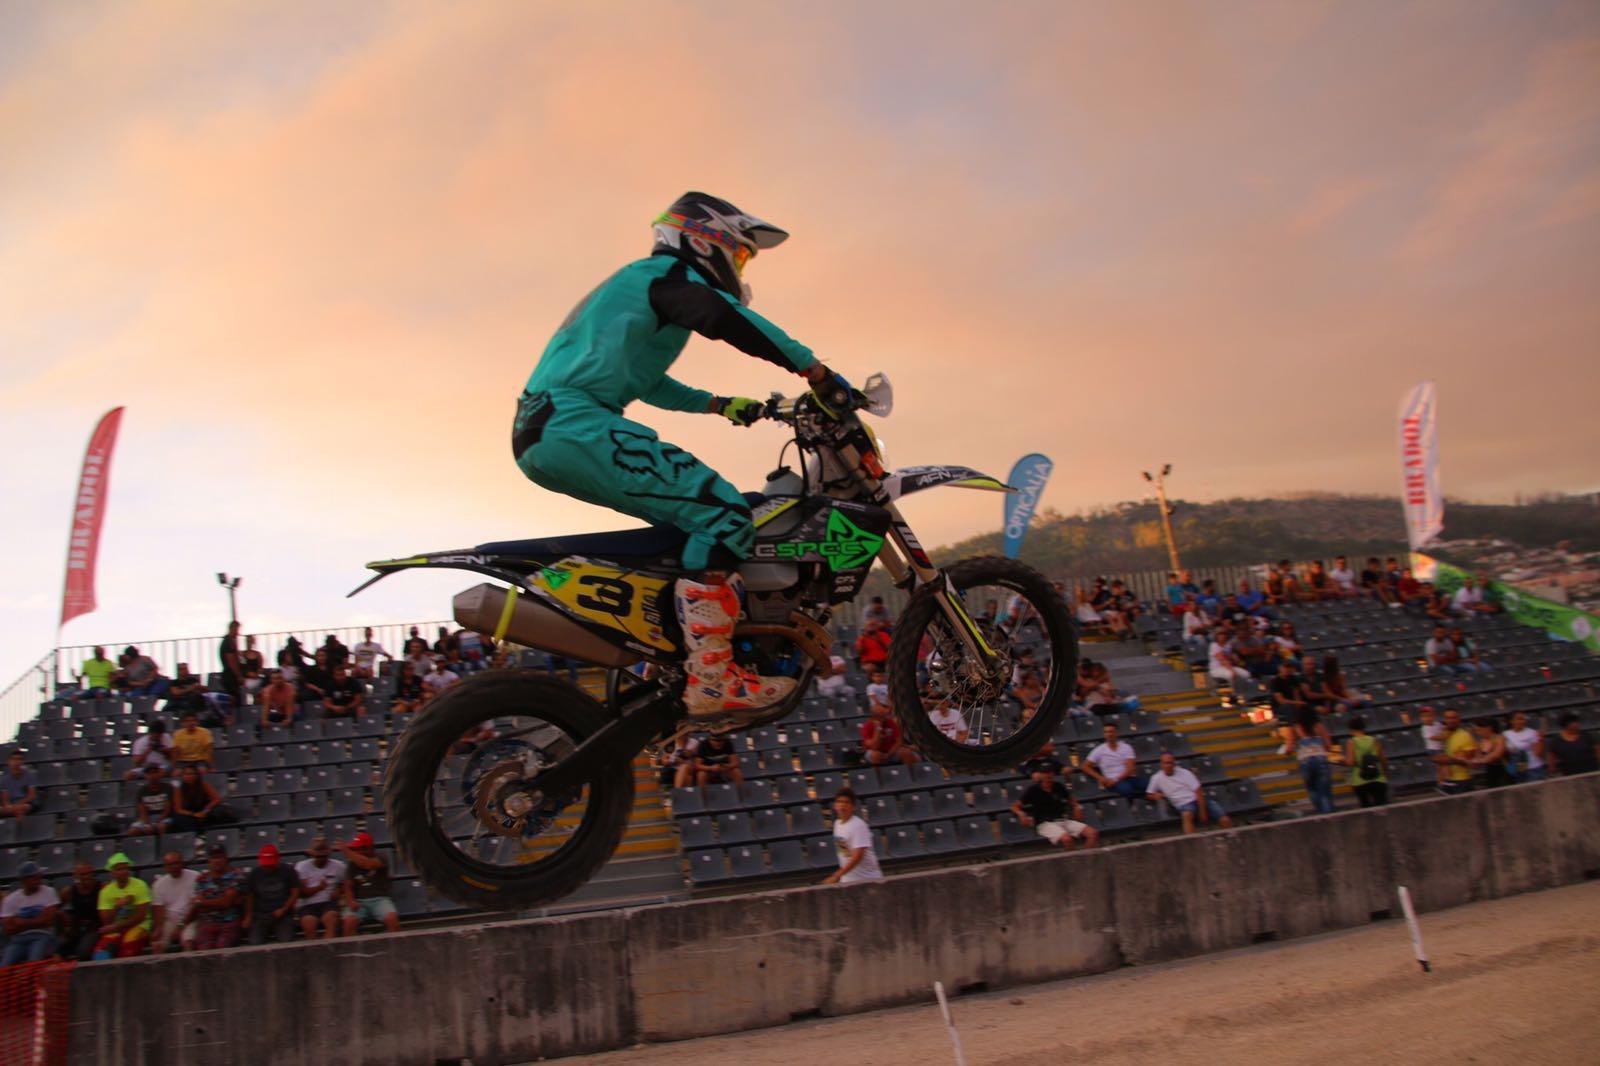 Racespec|Husqvarna|CFL obtém pontos importantes em Baltar